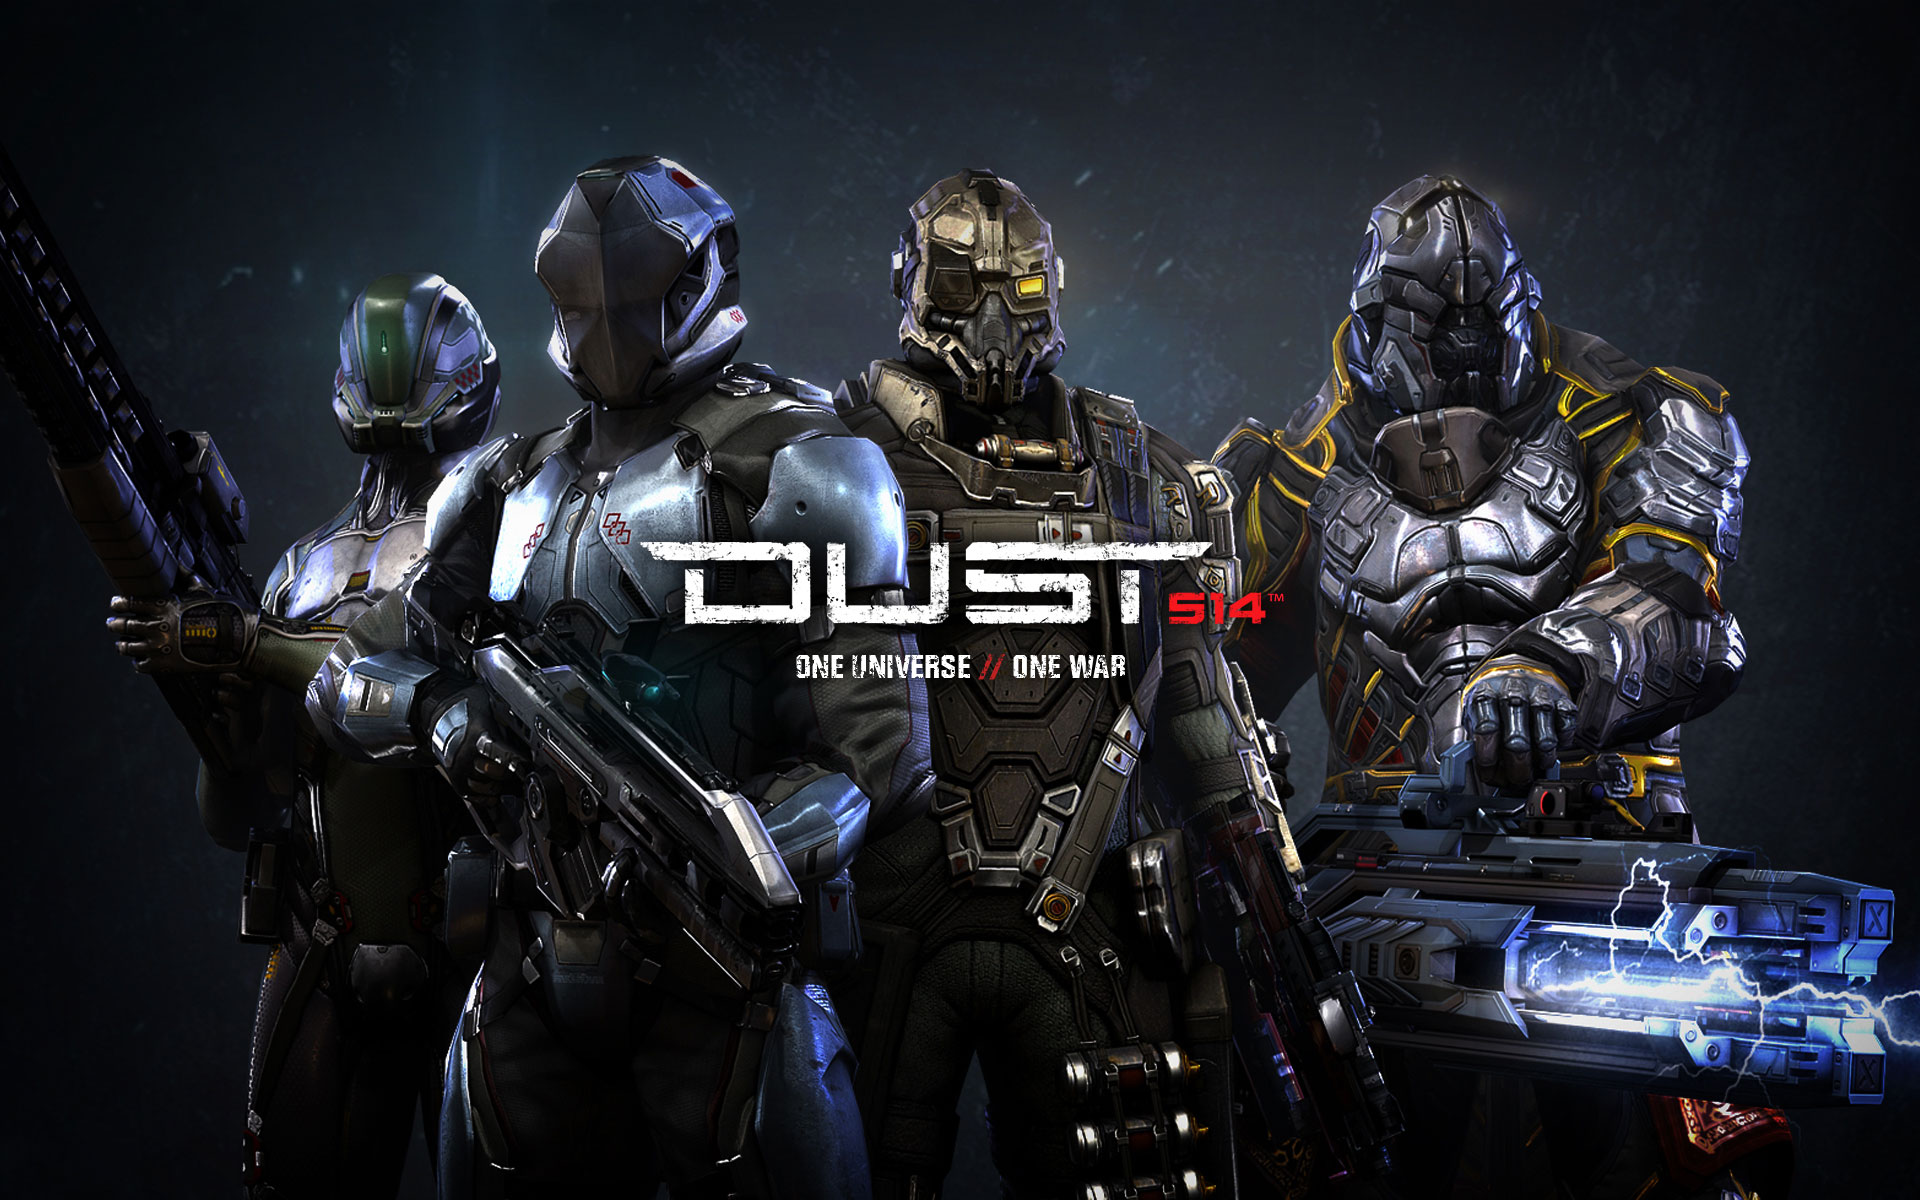 dust-514-1920×1200-wallpaper-gamerswallpapers-com